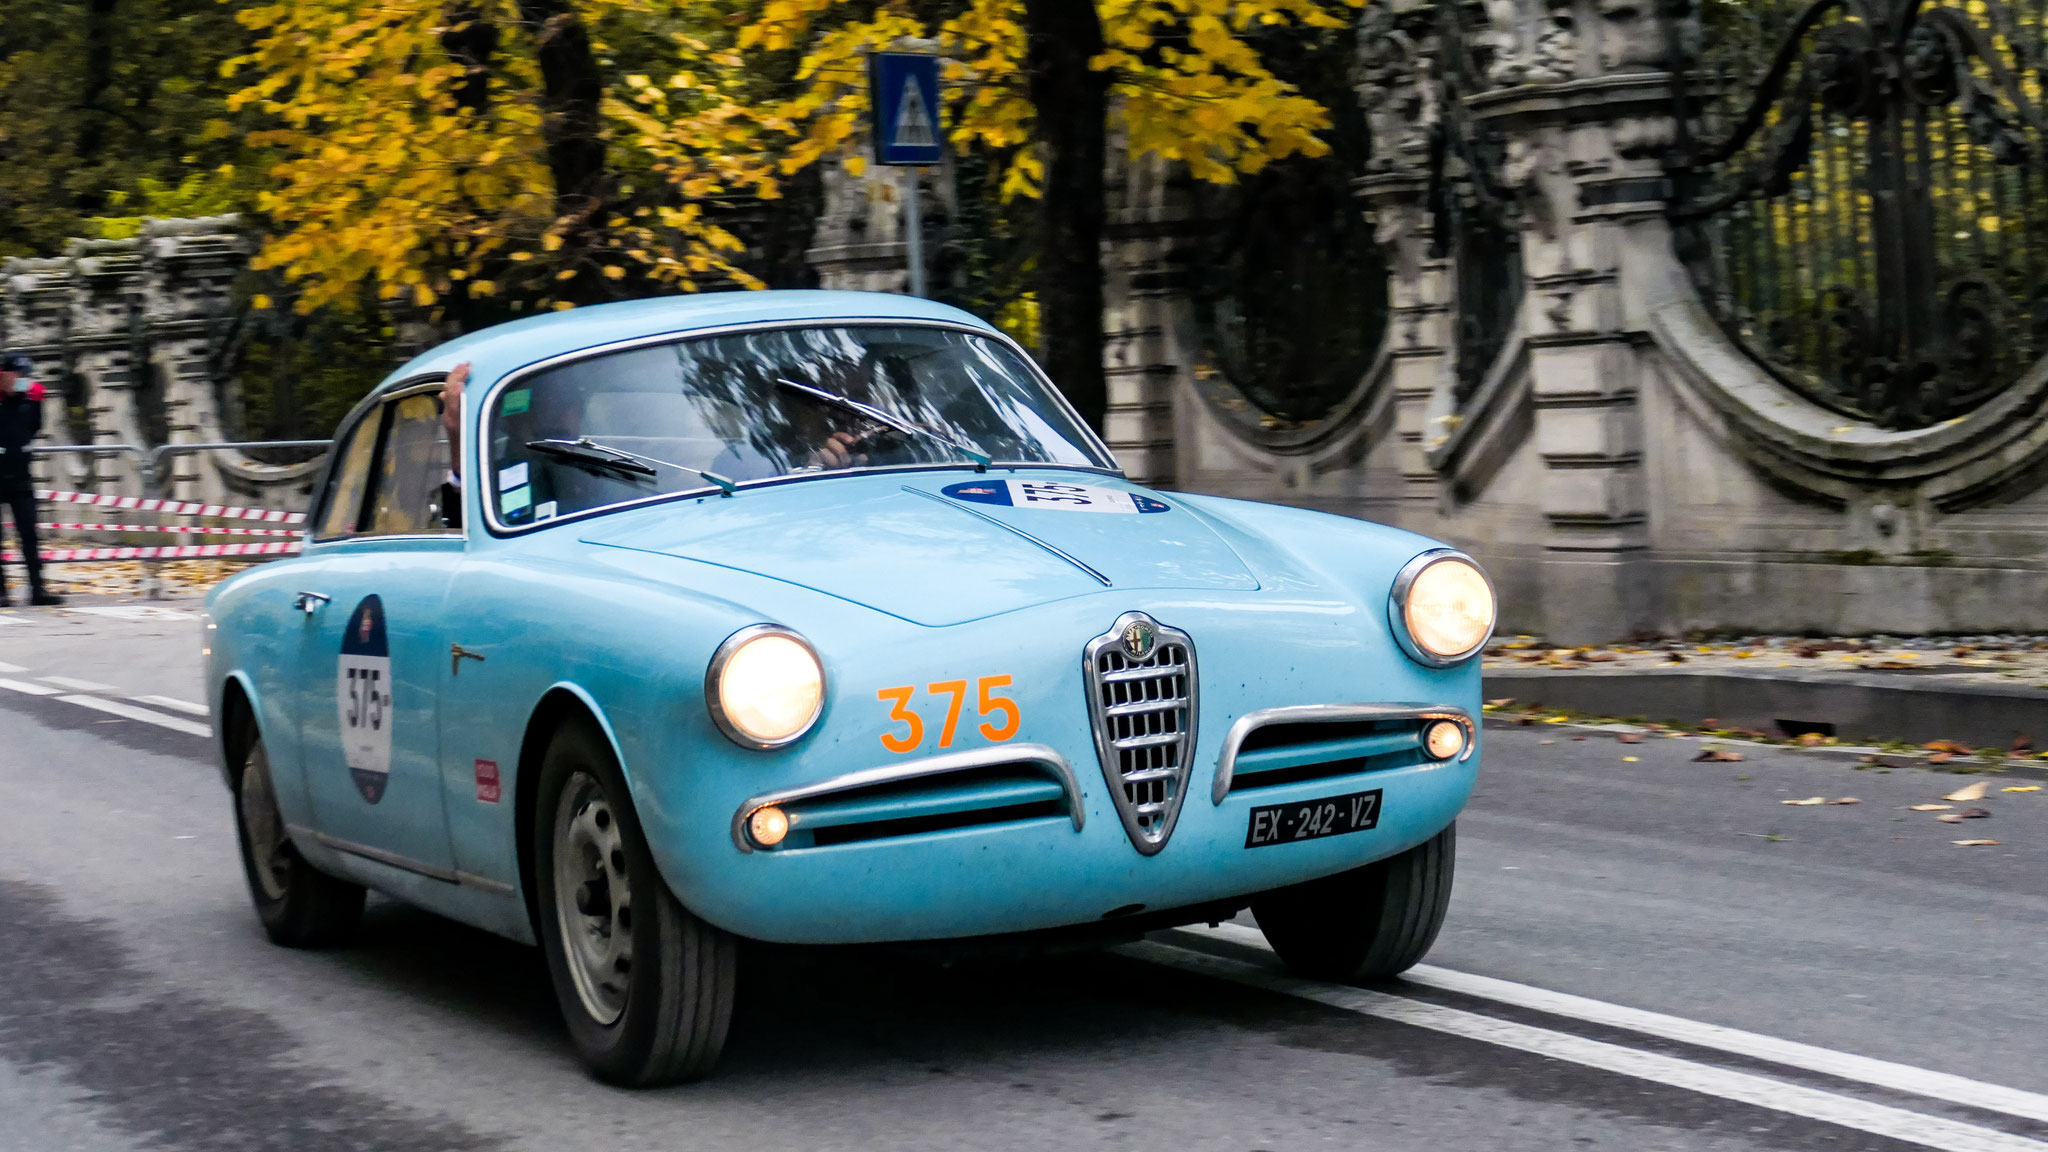 Alfa Romeo Giulietta Sprint Veloce - EX-242-VZ (FRA)